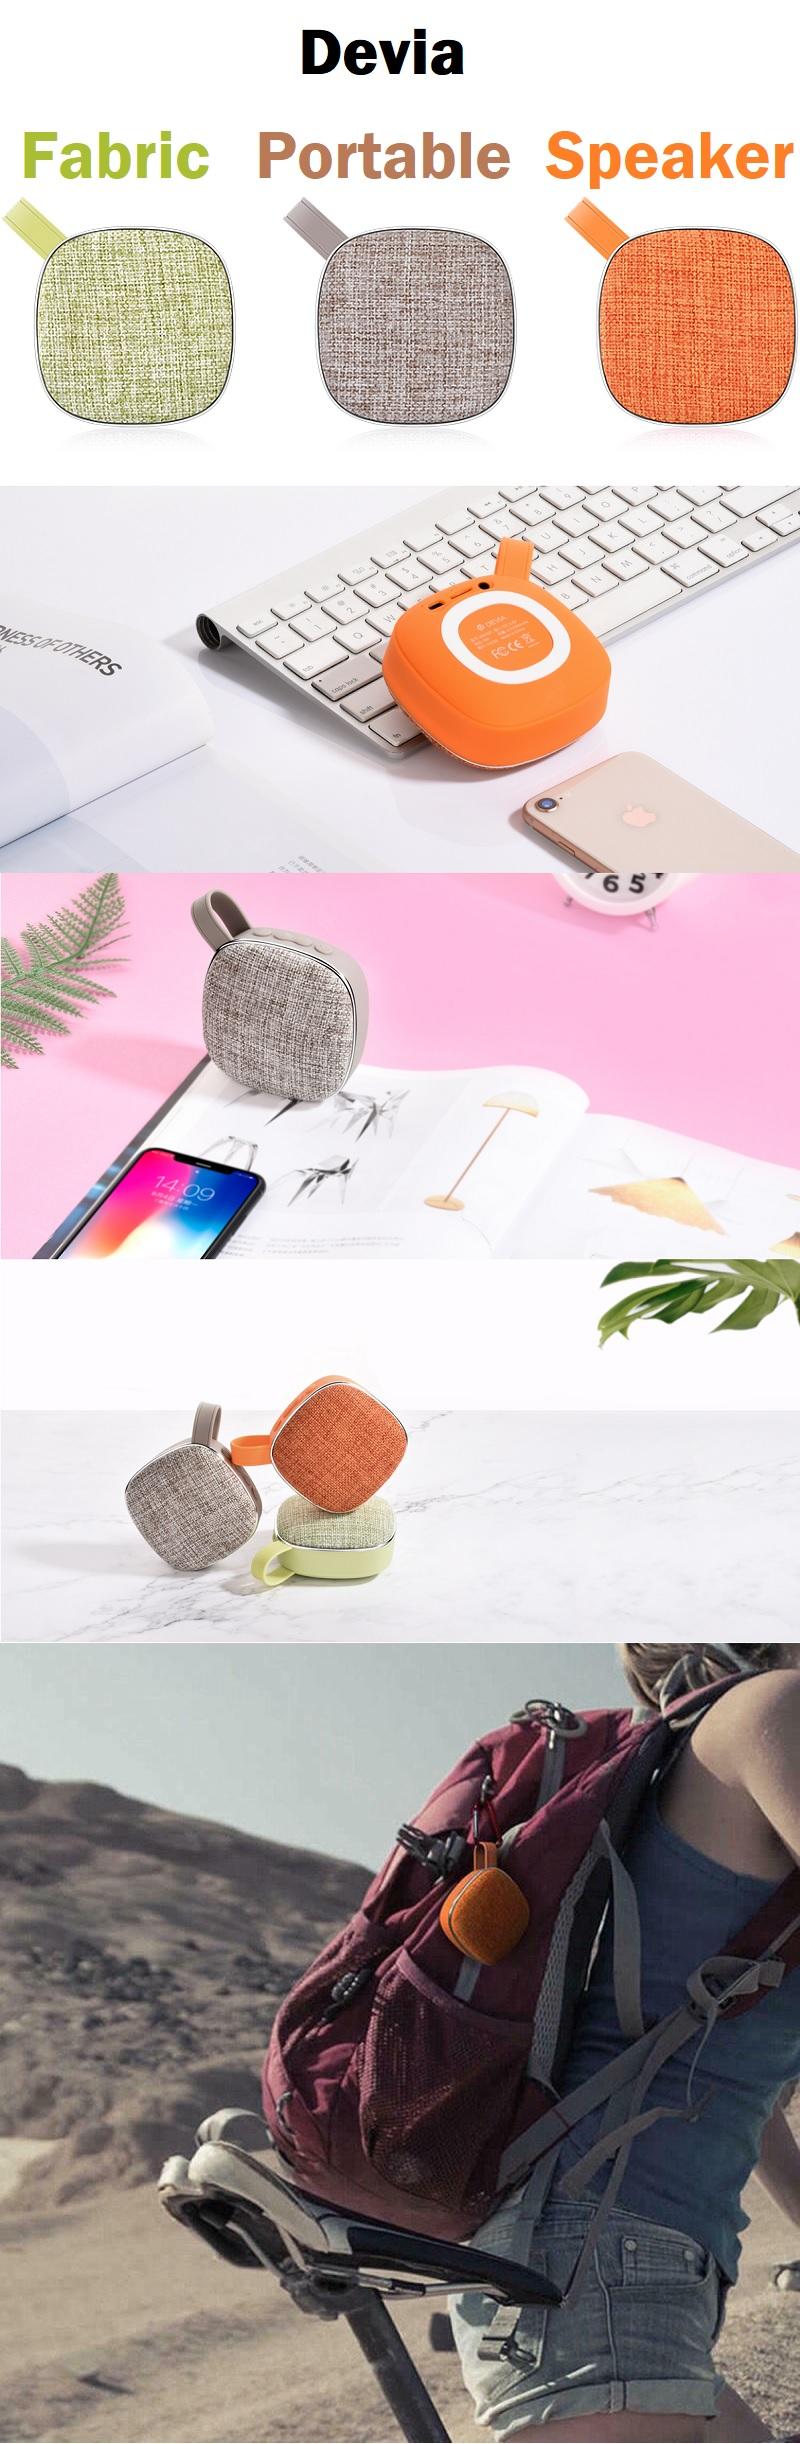 devia-fabric-portable-speaker.jpg